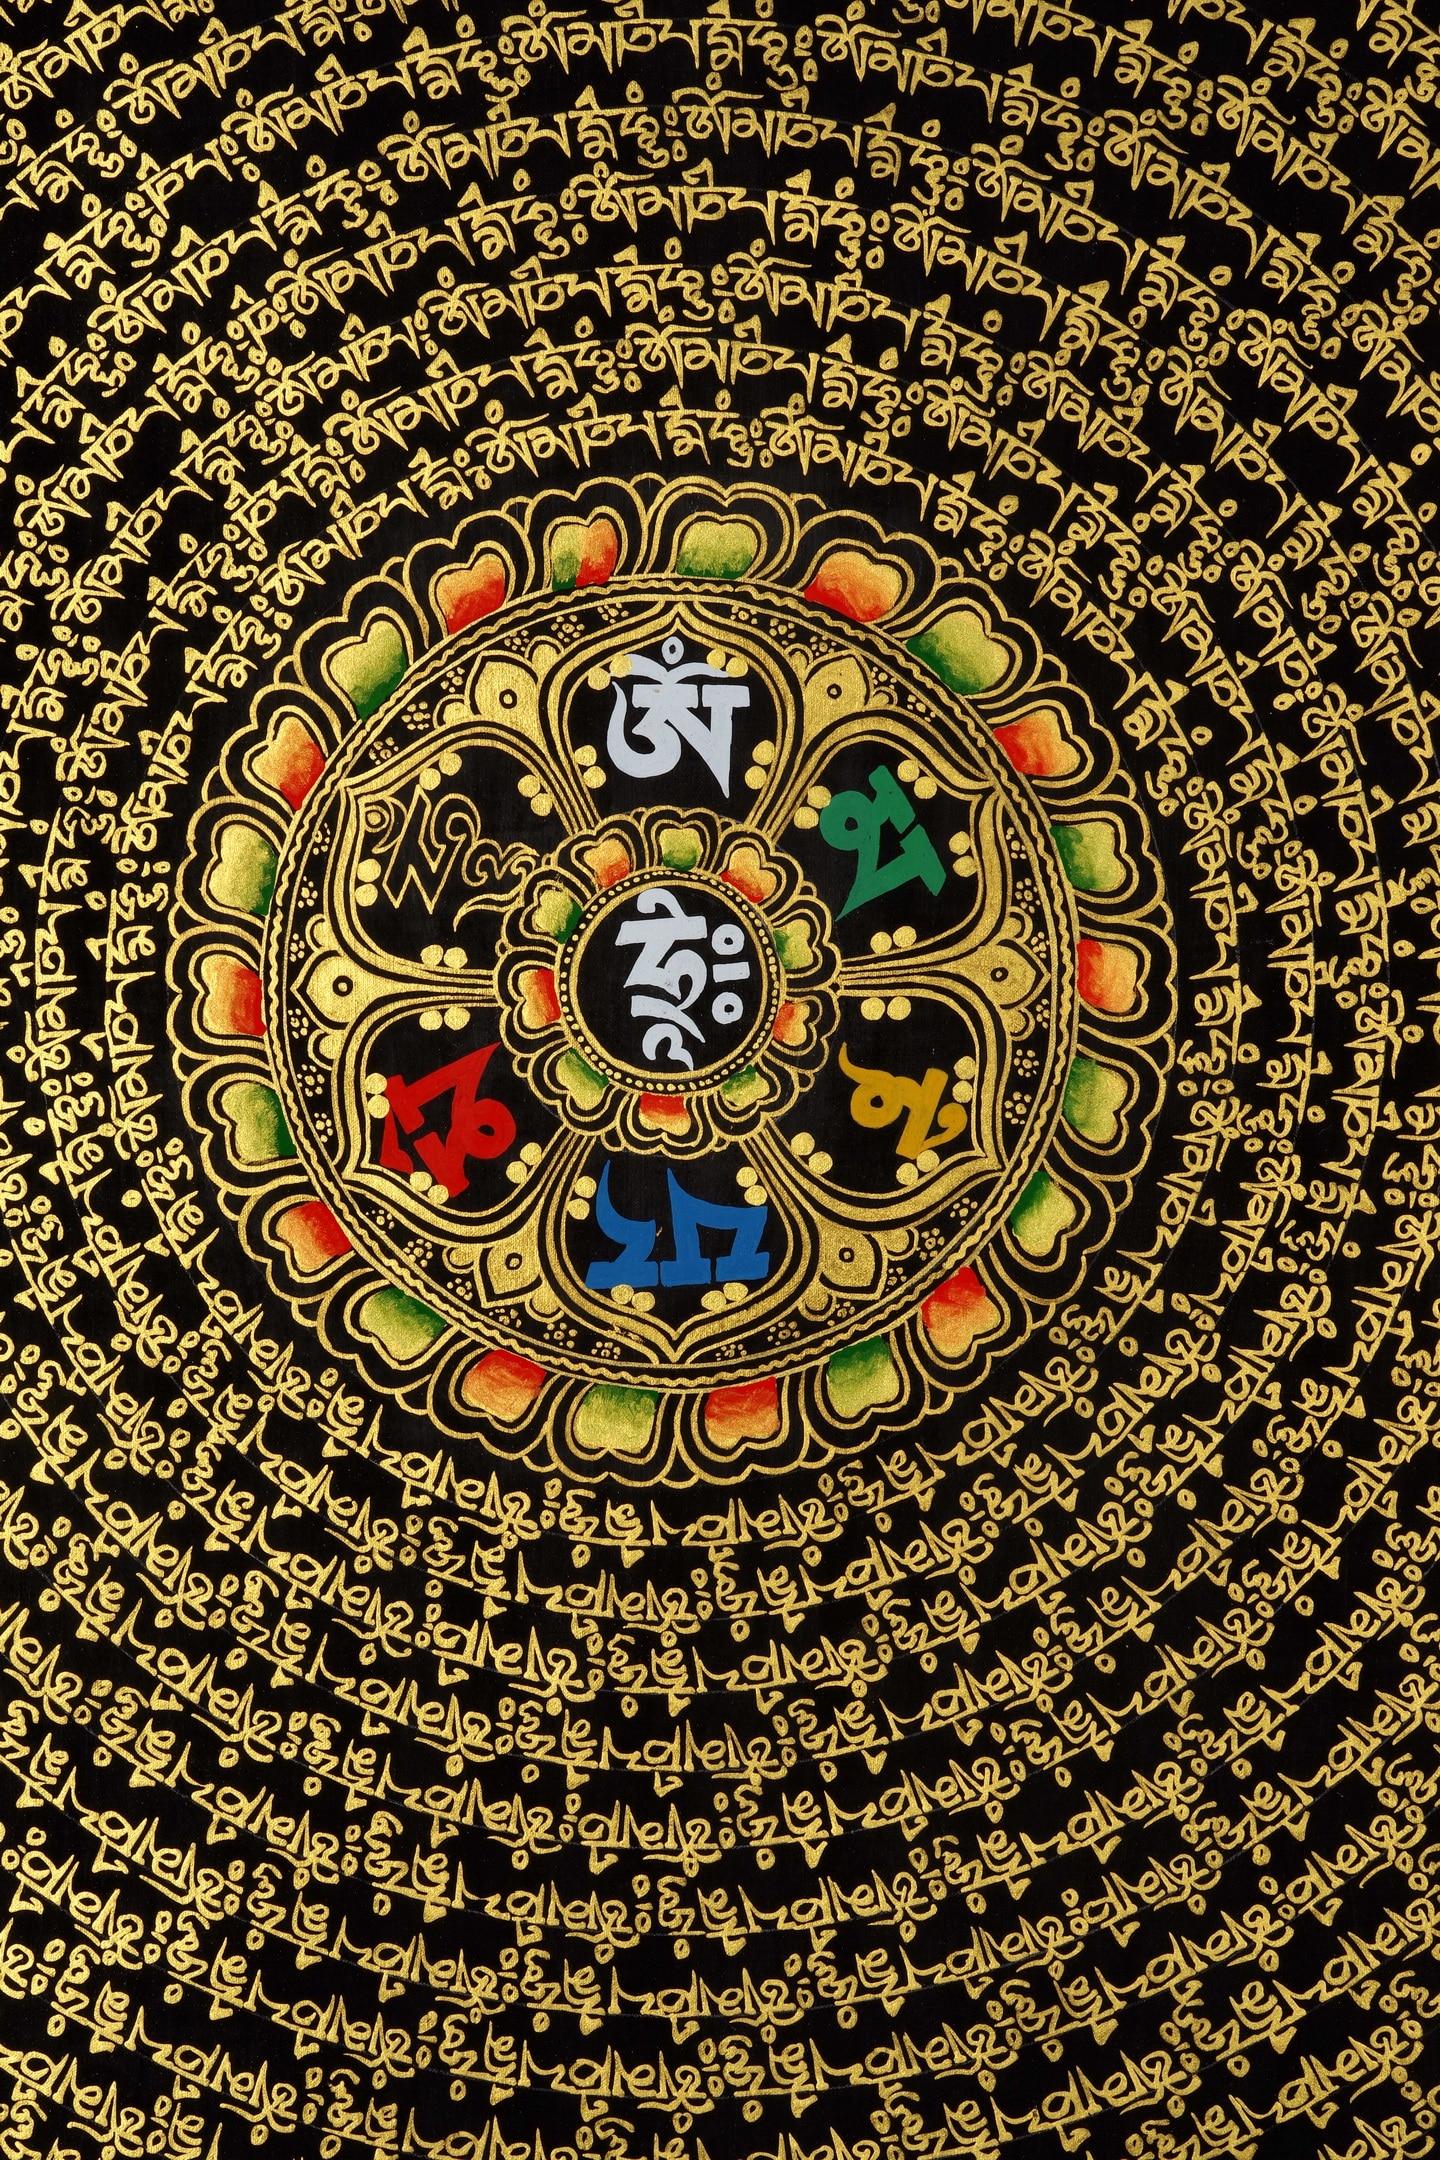 100CM * 100CM sixwords Mandala Lama puro pintado a mano pinturas thangka mantra de Guanyin